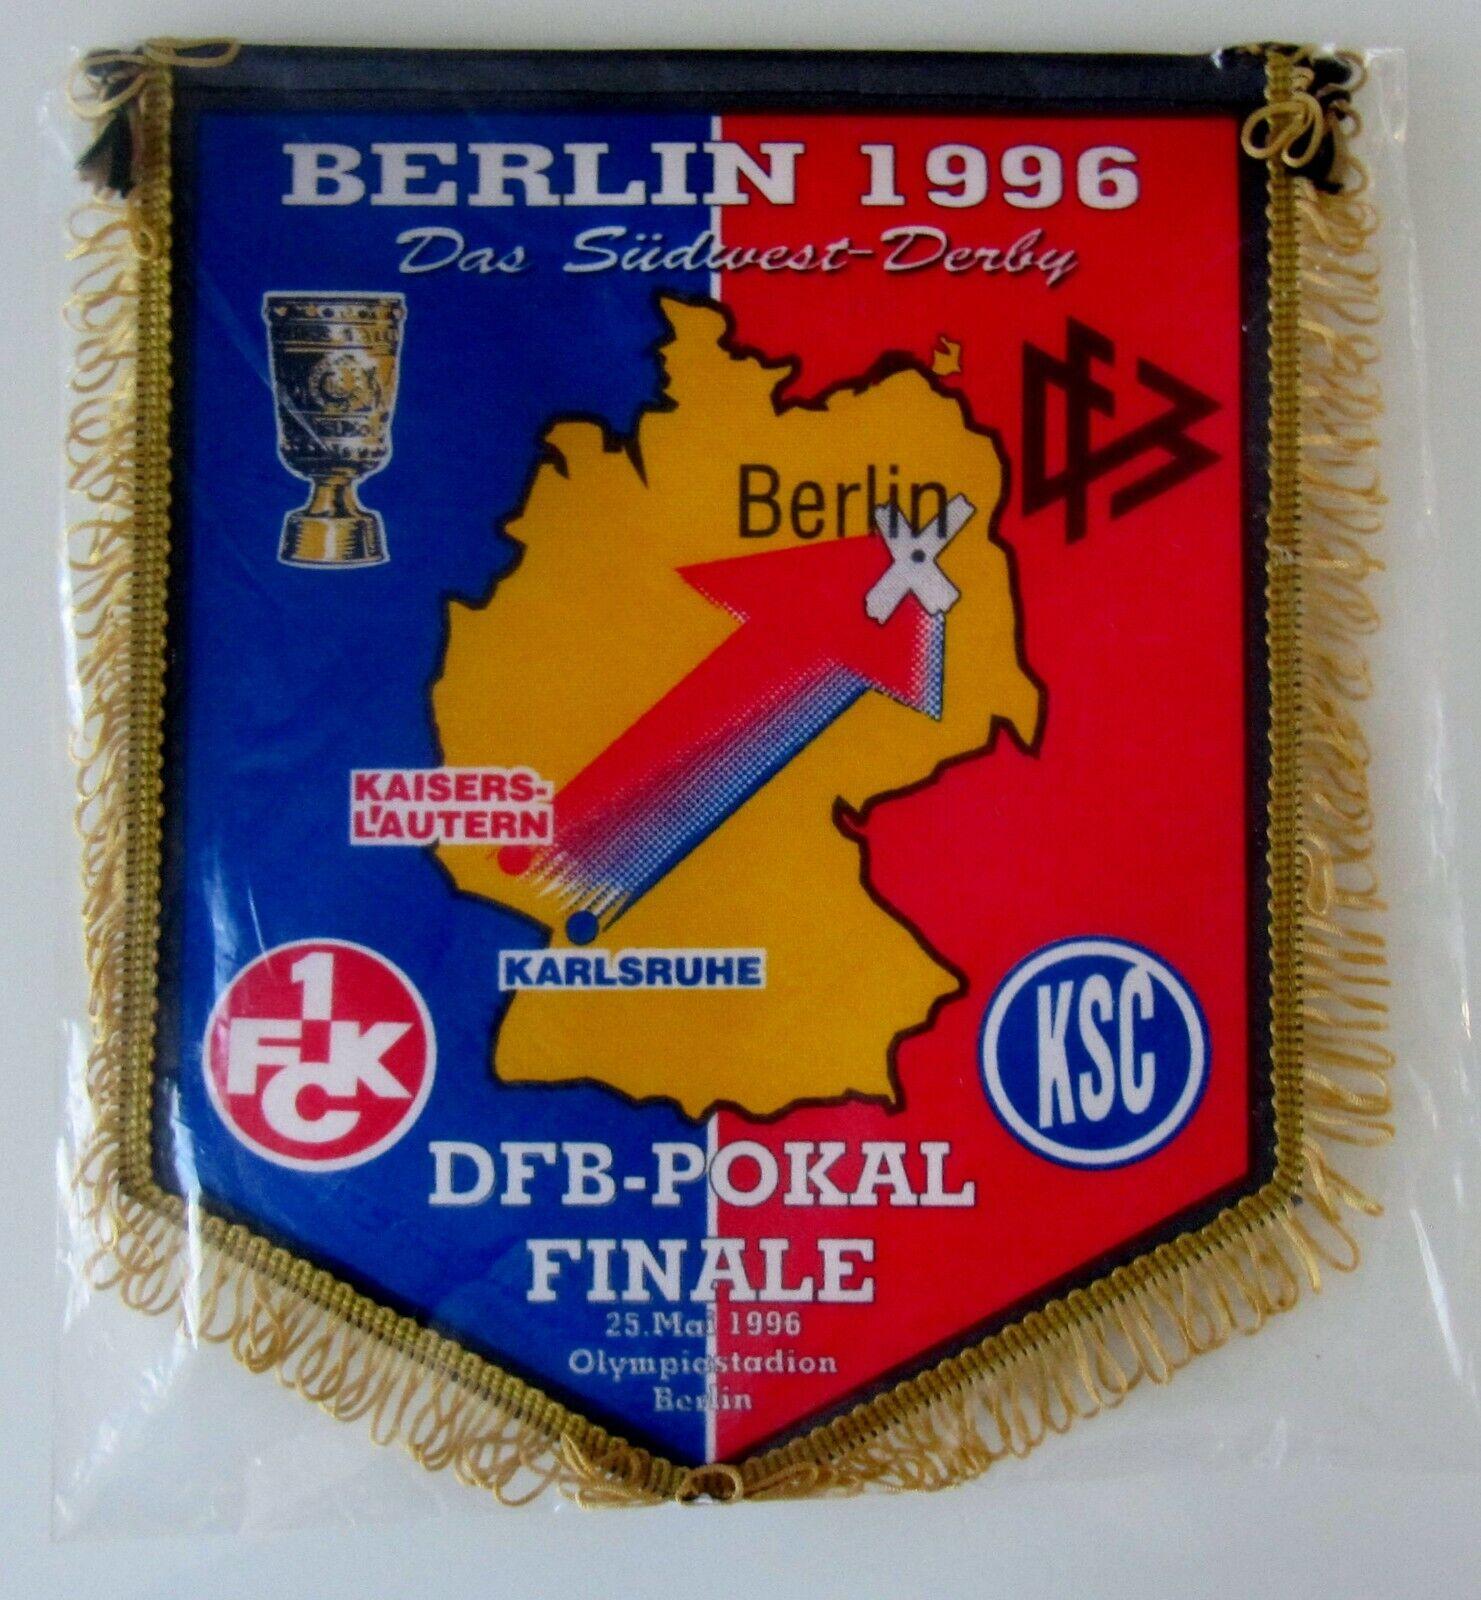 NEU  Wimpel zum Pokalfinale Berlin 1996  Karlsruher SC - 1. FC Kaiserslautern  | Hervorragende Eigenschaften